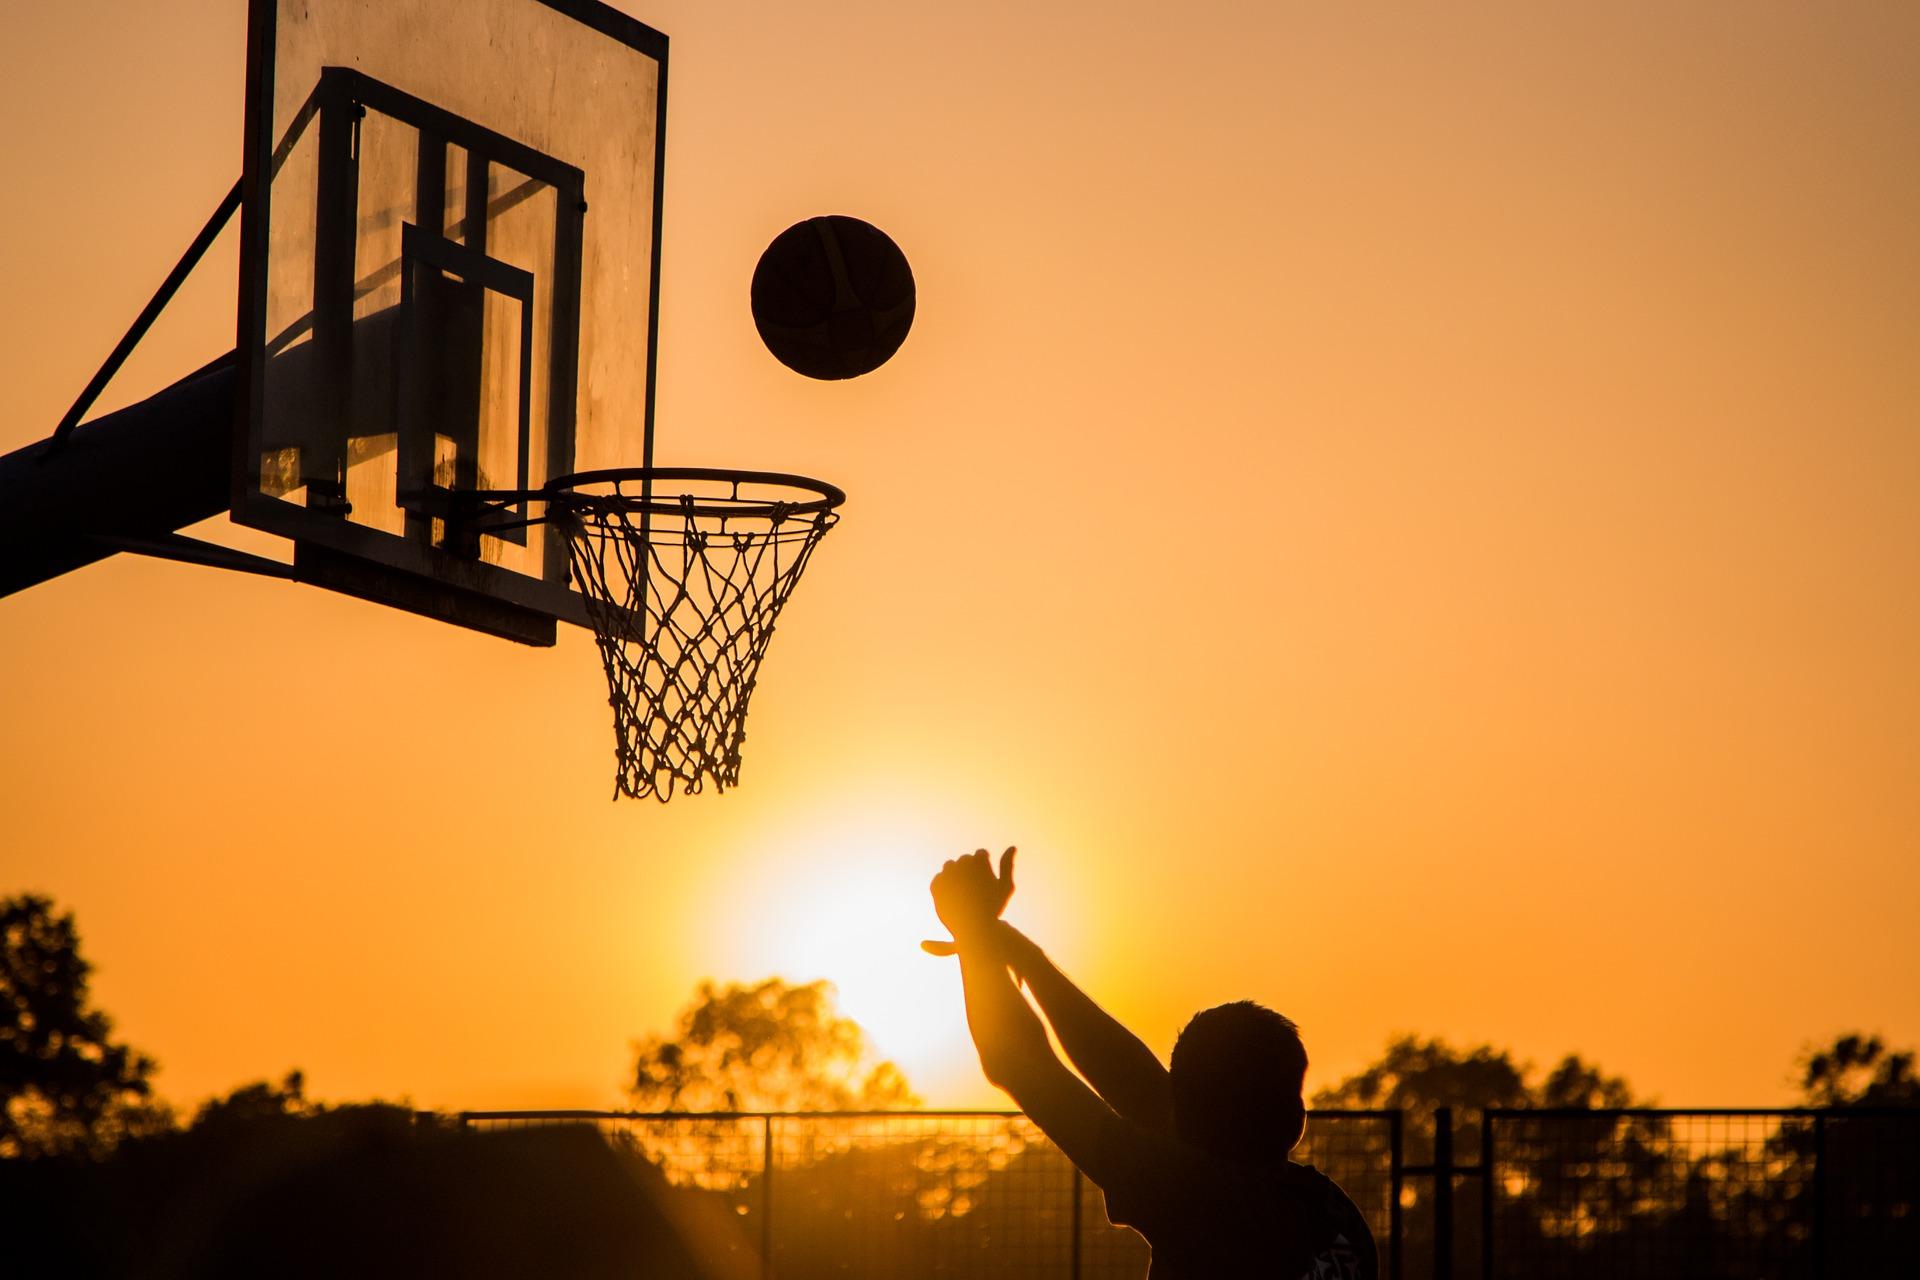 wanderers club Basketball 3